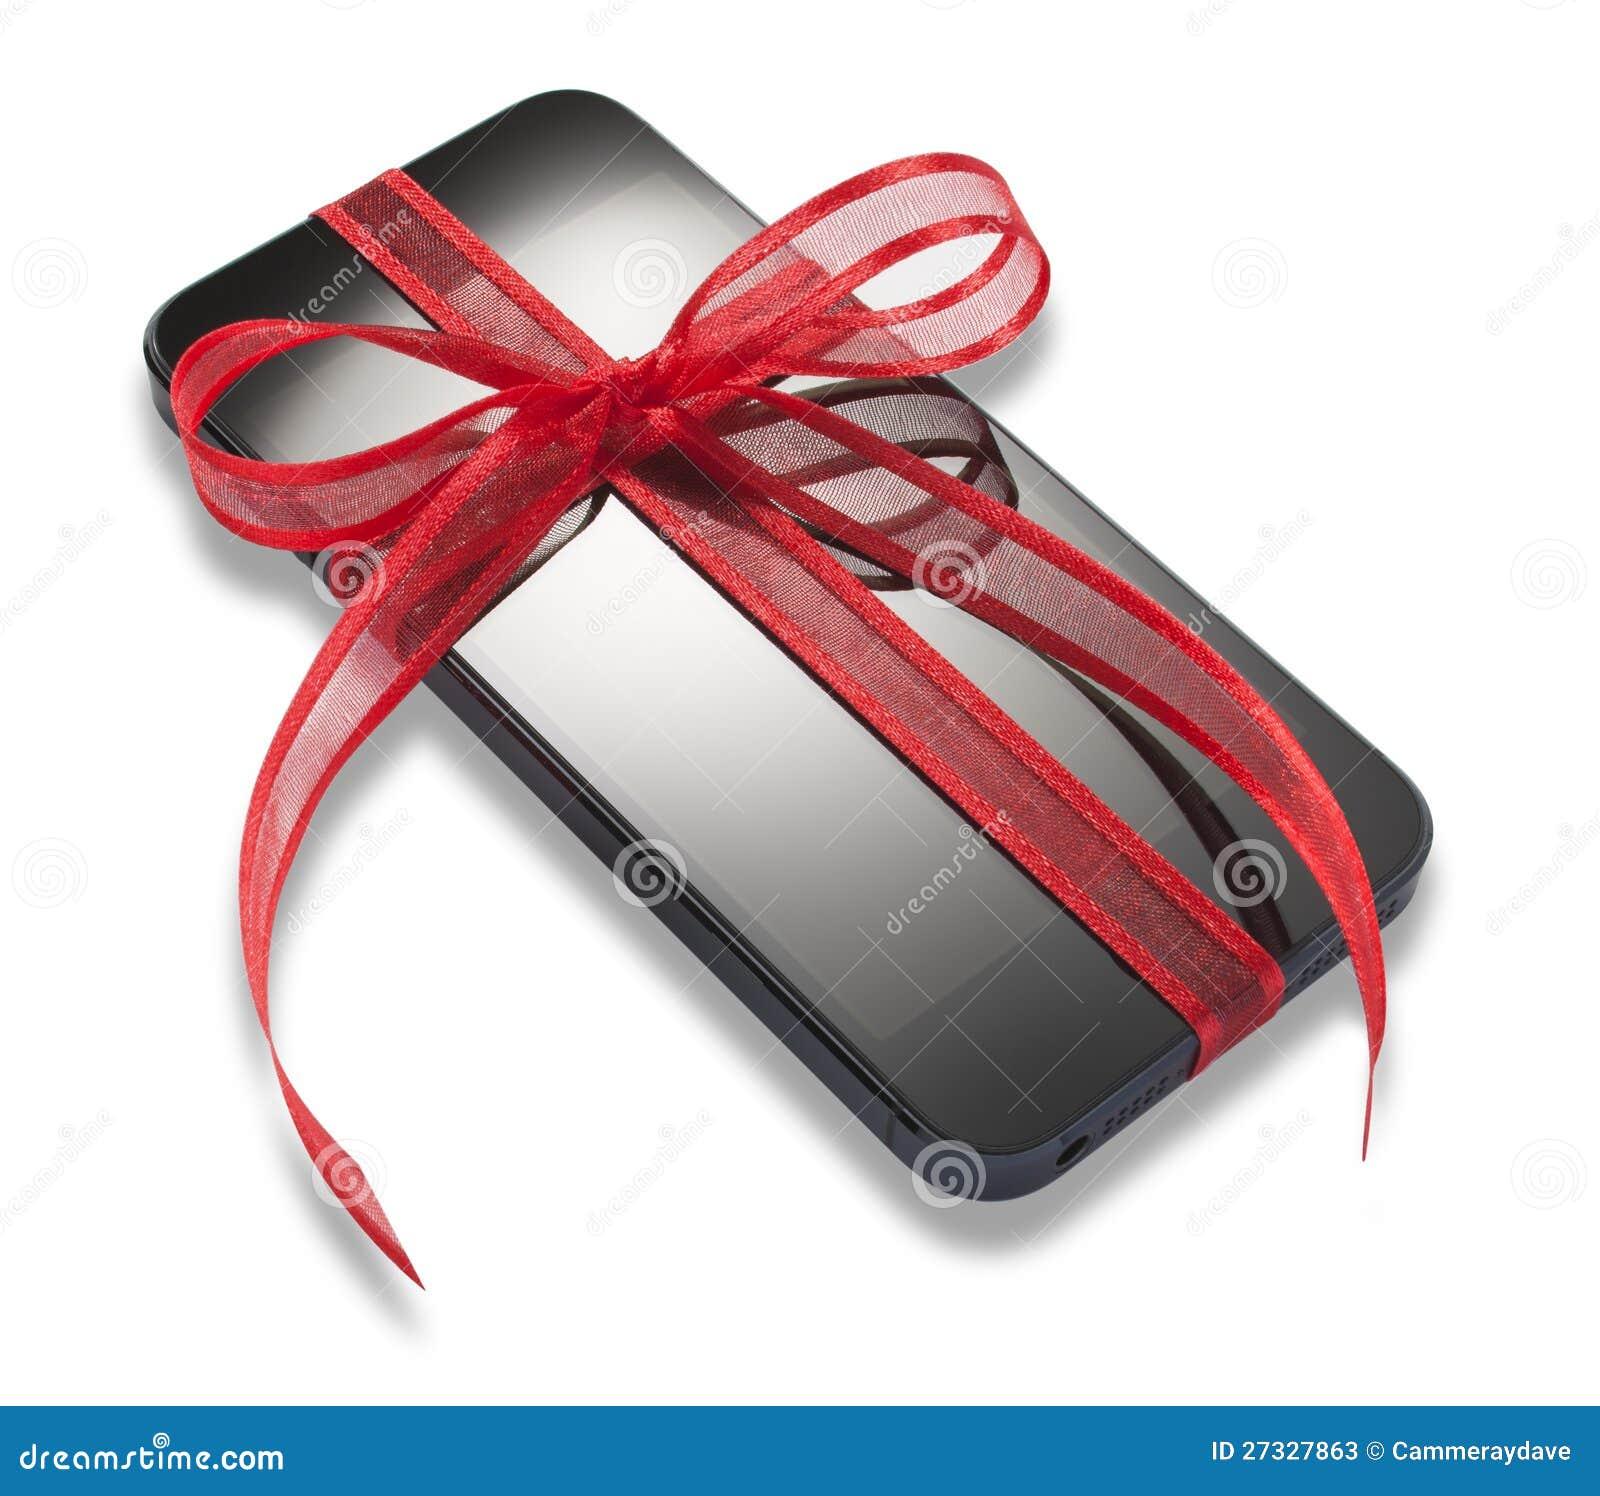 iphone cadeau de 5 cadeaux de no l photo stock ditorial image 27327863. Black Bedroom Furniture Sets. Home Design Ideas